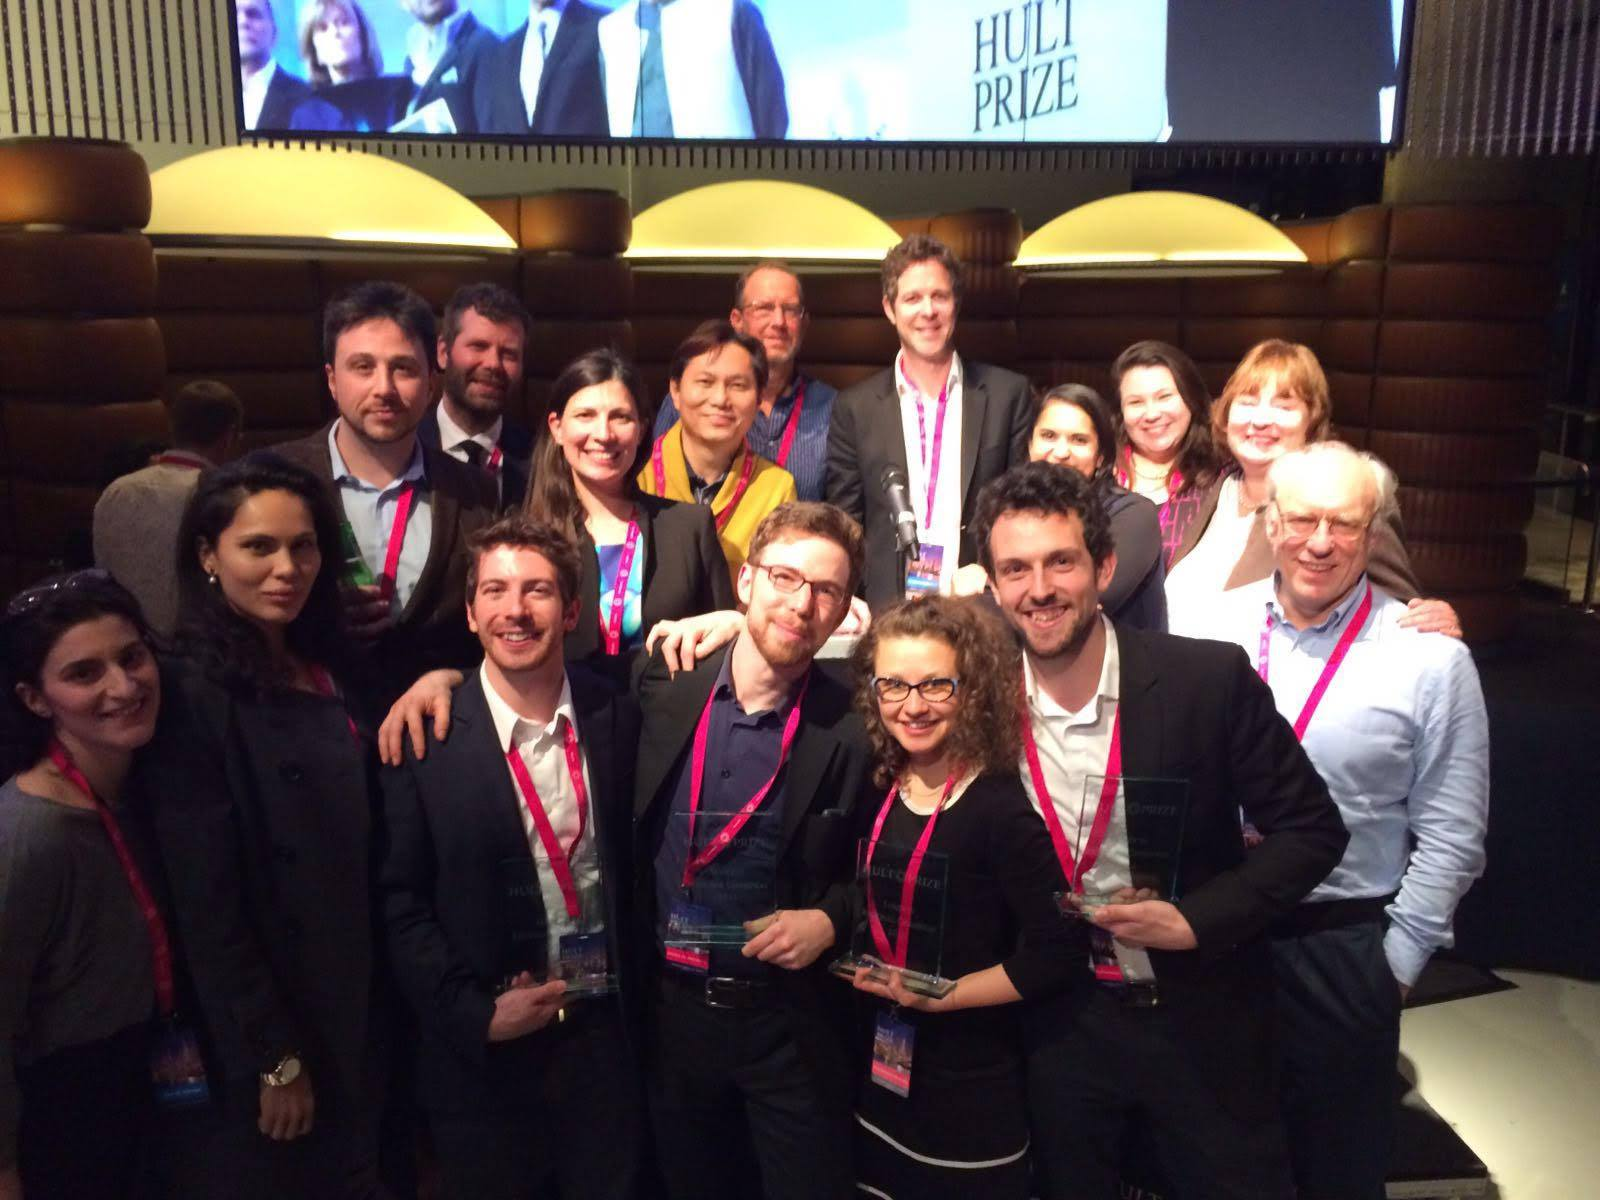 Gates Cambridge Hult Prize success